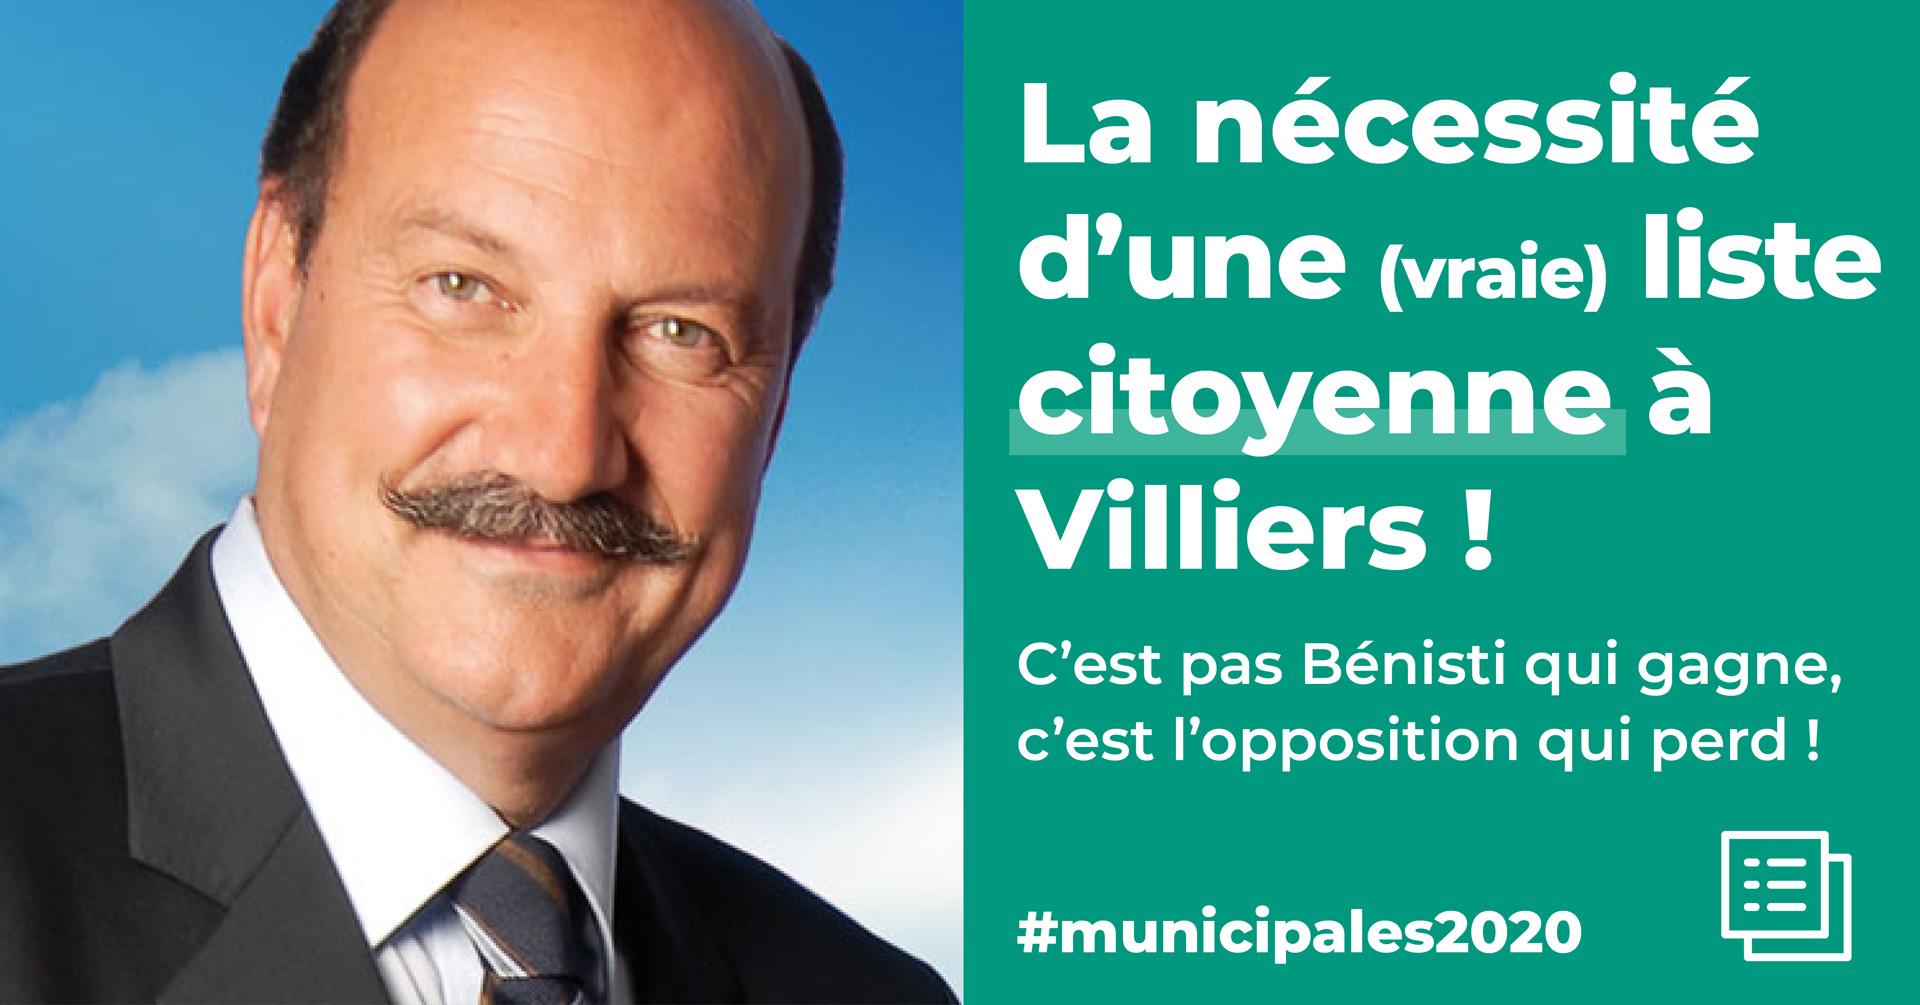 https://vav94.fr/wp-content/uploads/2020/01/JACQUES-ALAIN-BENISTI-LR-UMP-VILLIERS-A-VENIR-VILLIERS-SUR-MARNE-VAV-MUNICIPALES-2020-1.jpg